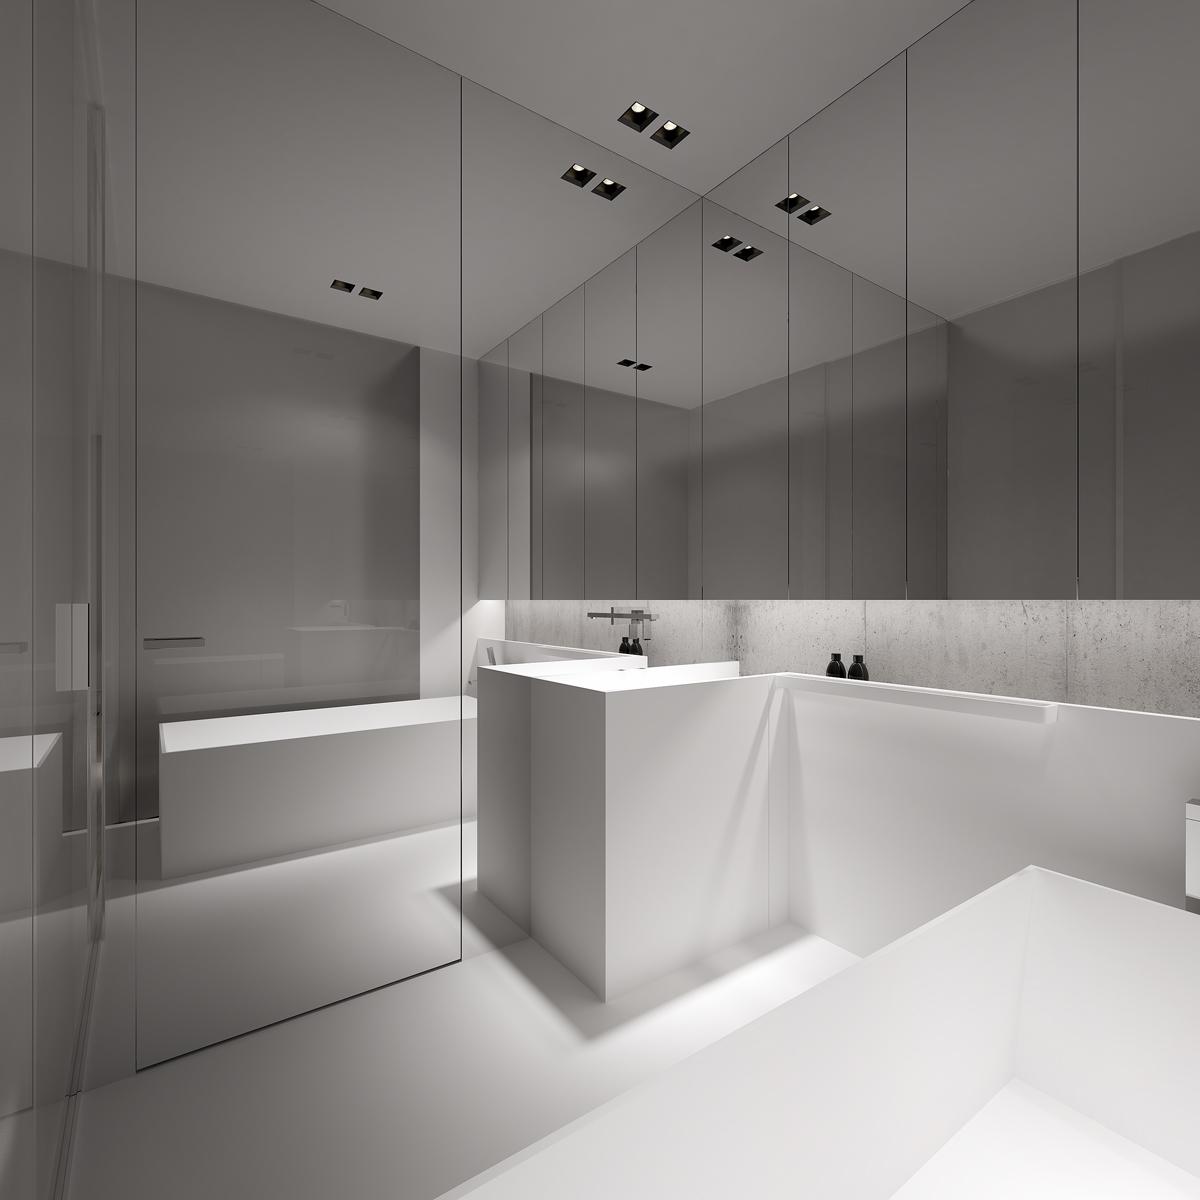 Stark Sharp  Minimalistic Interiors By Oporski Architektura